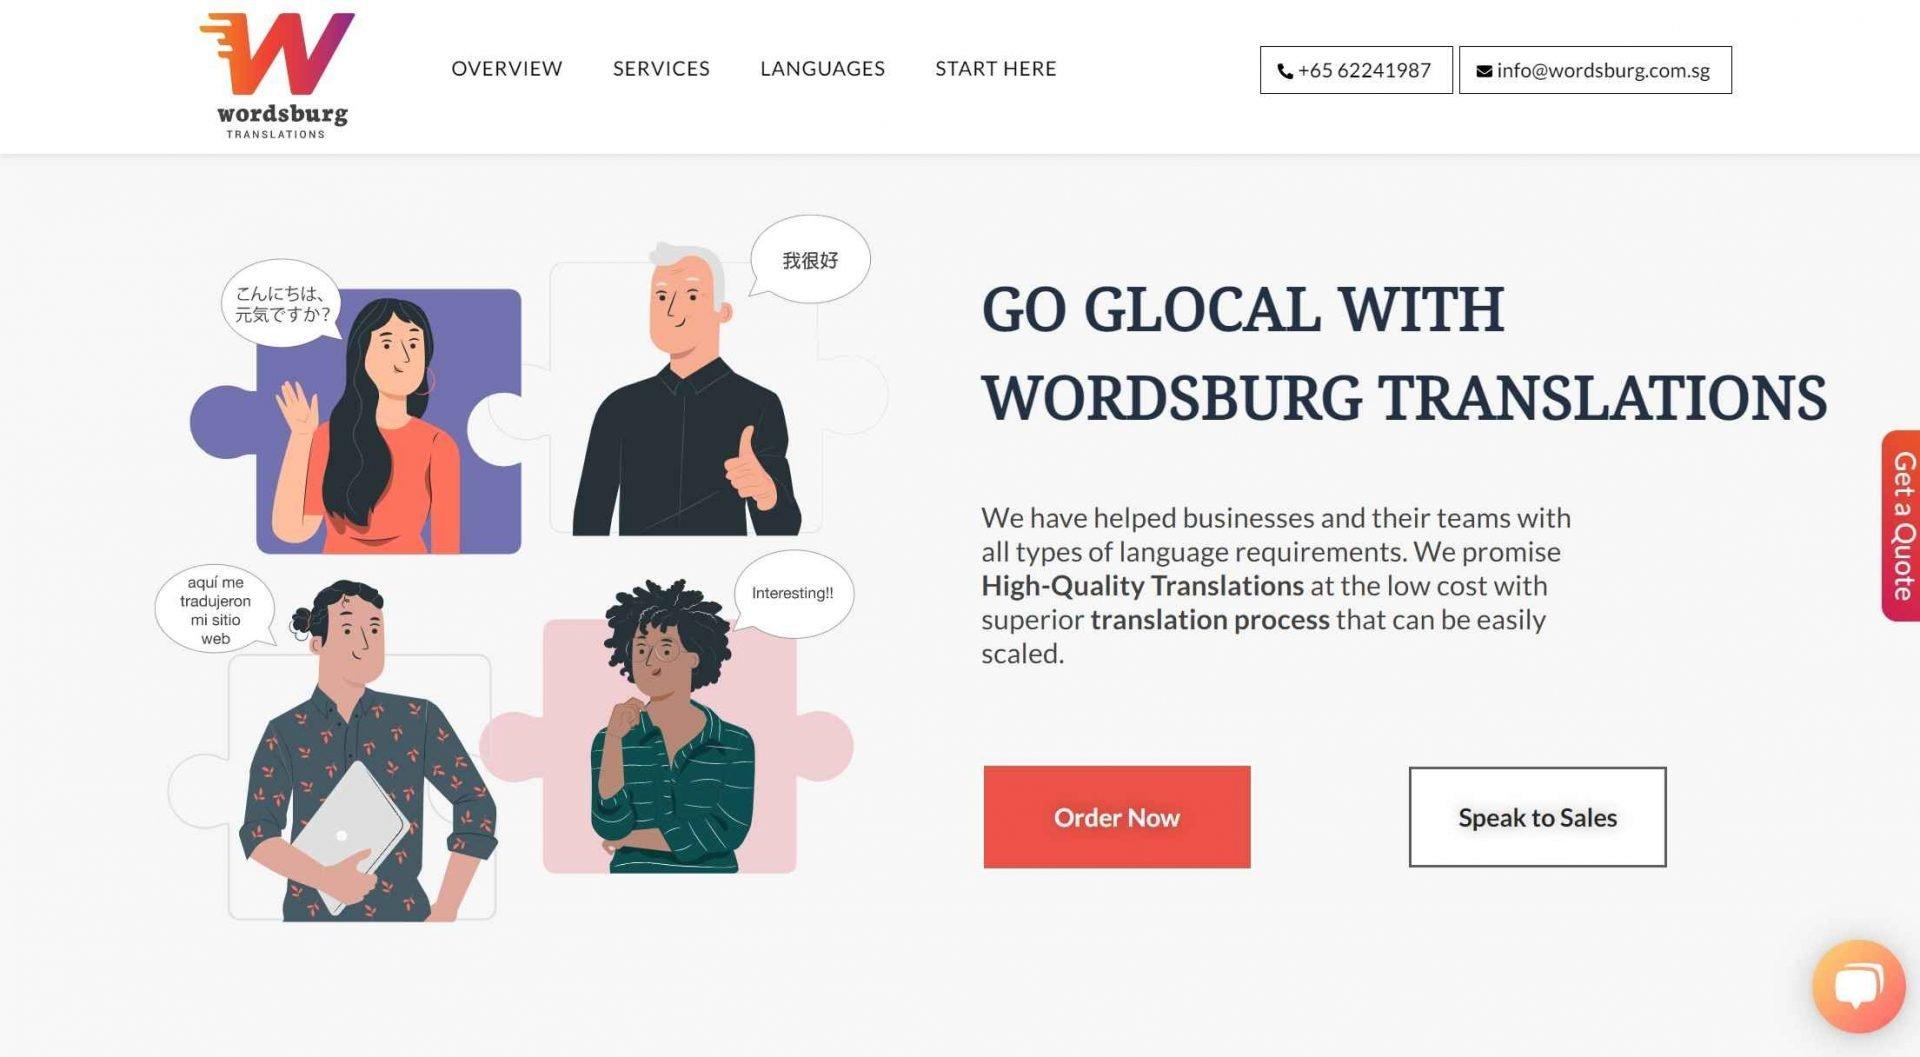 wordsburg